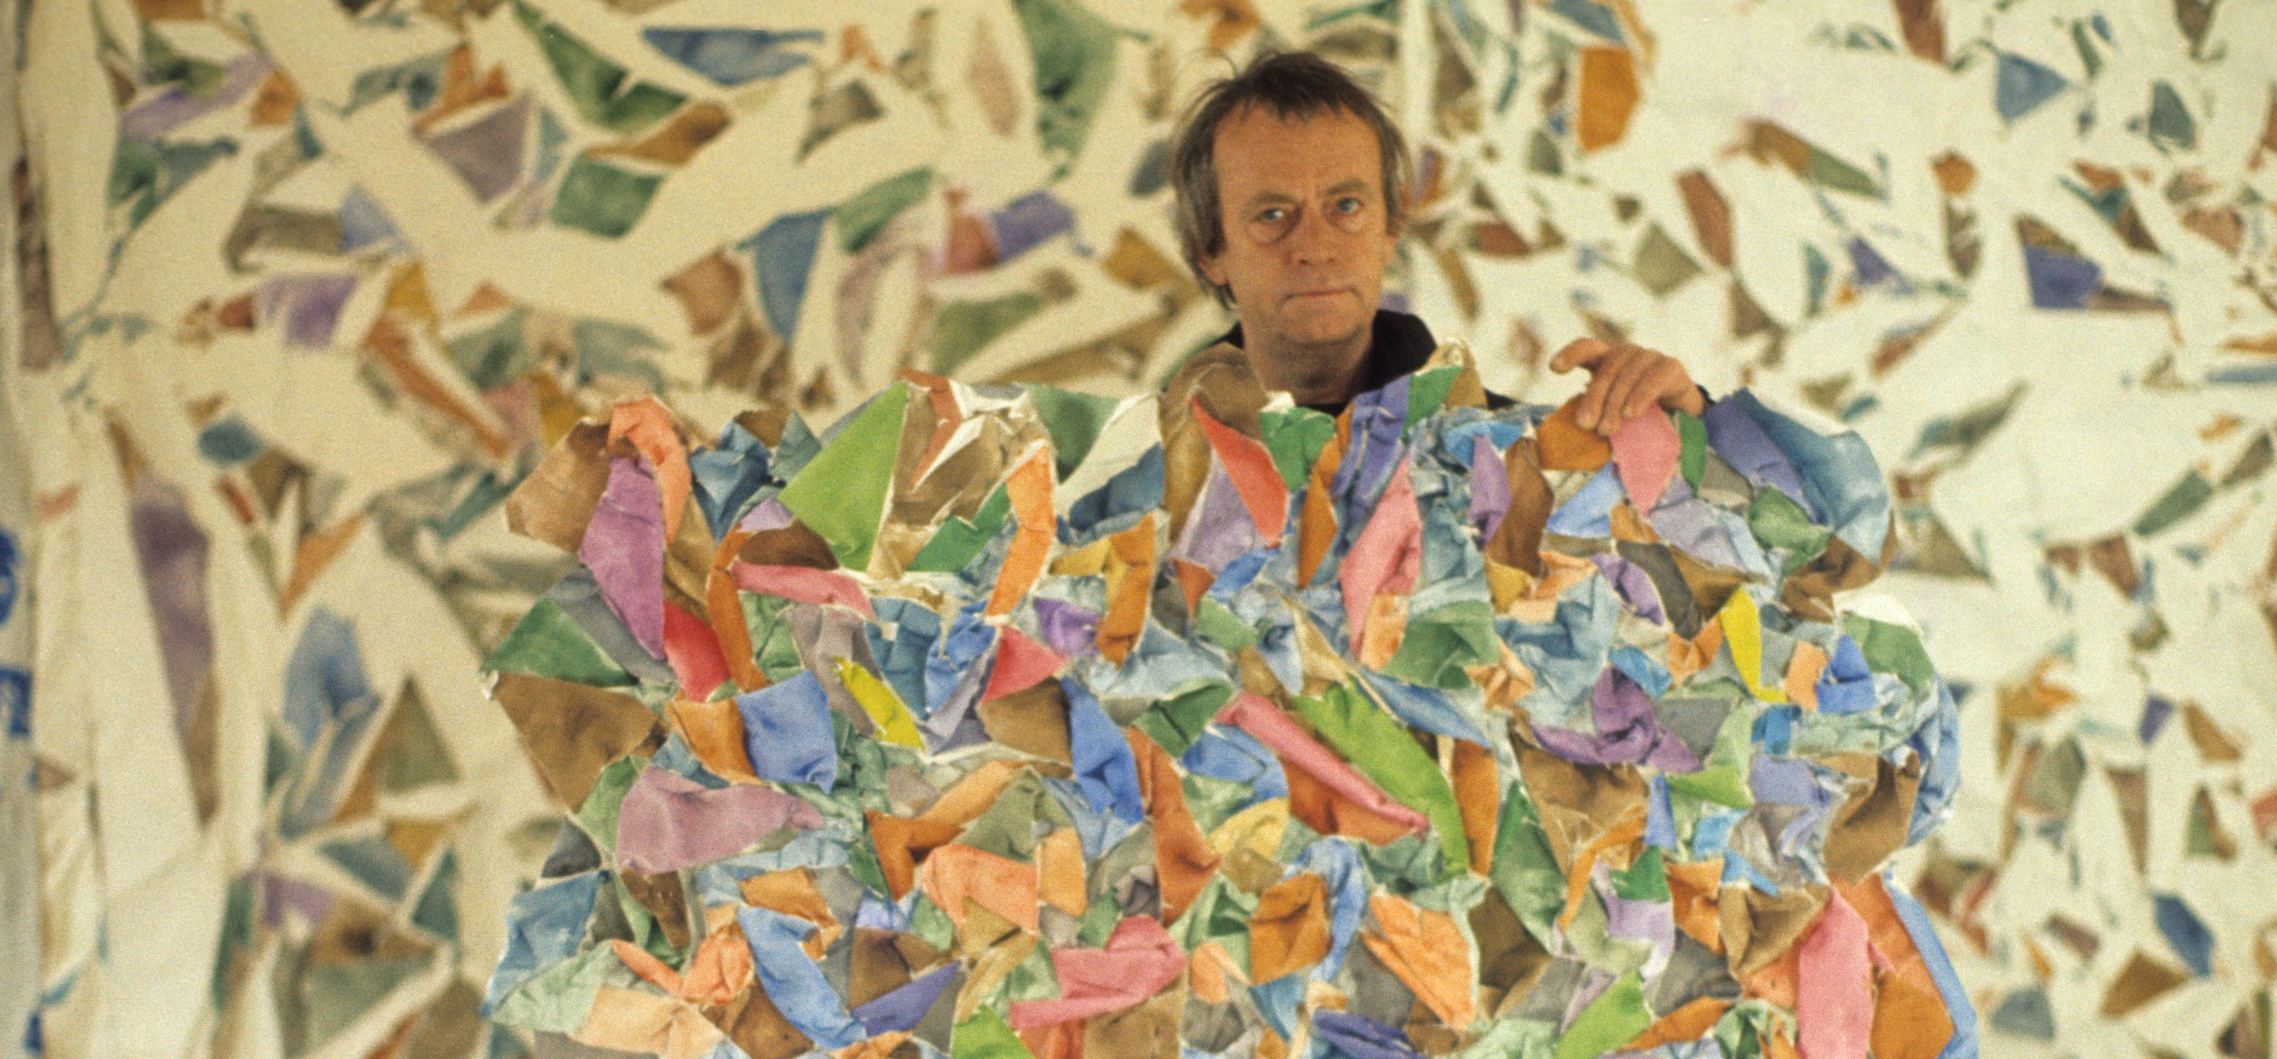 Simon Hantaï The artist